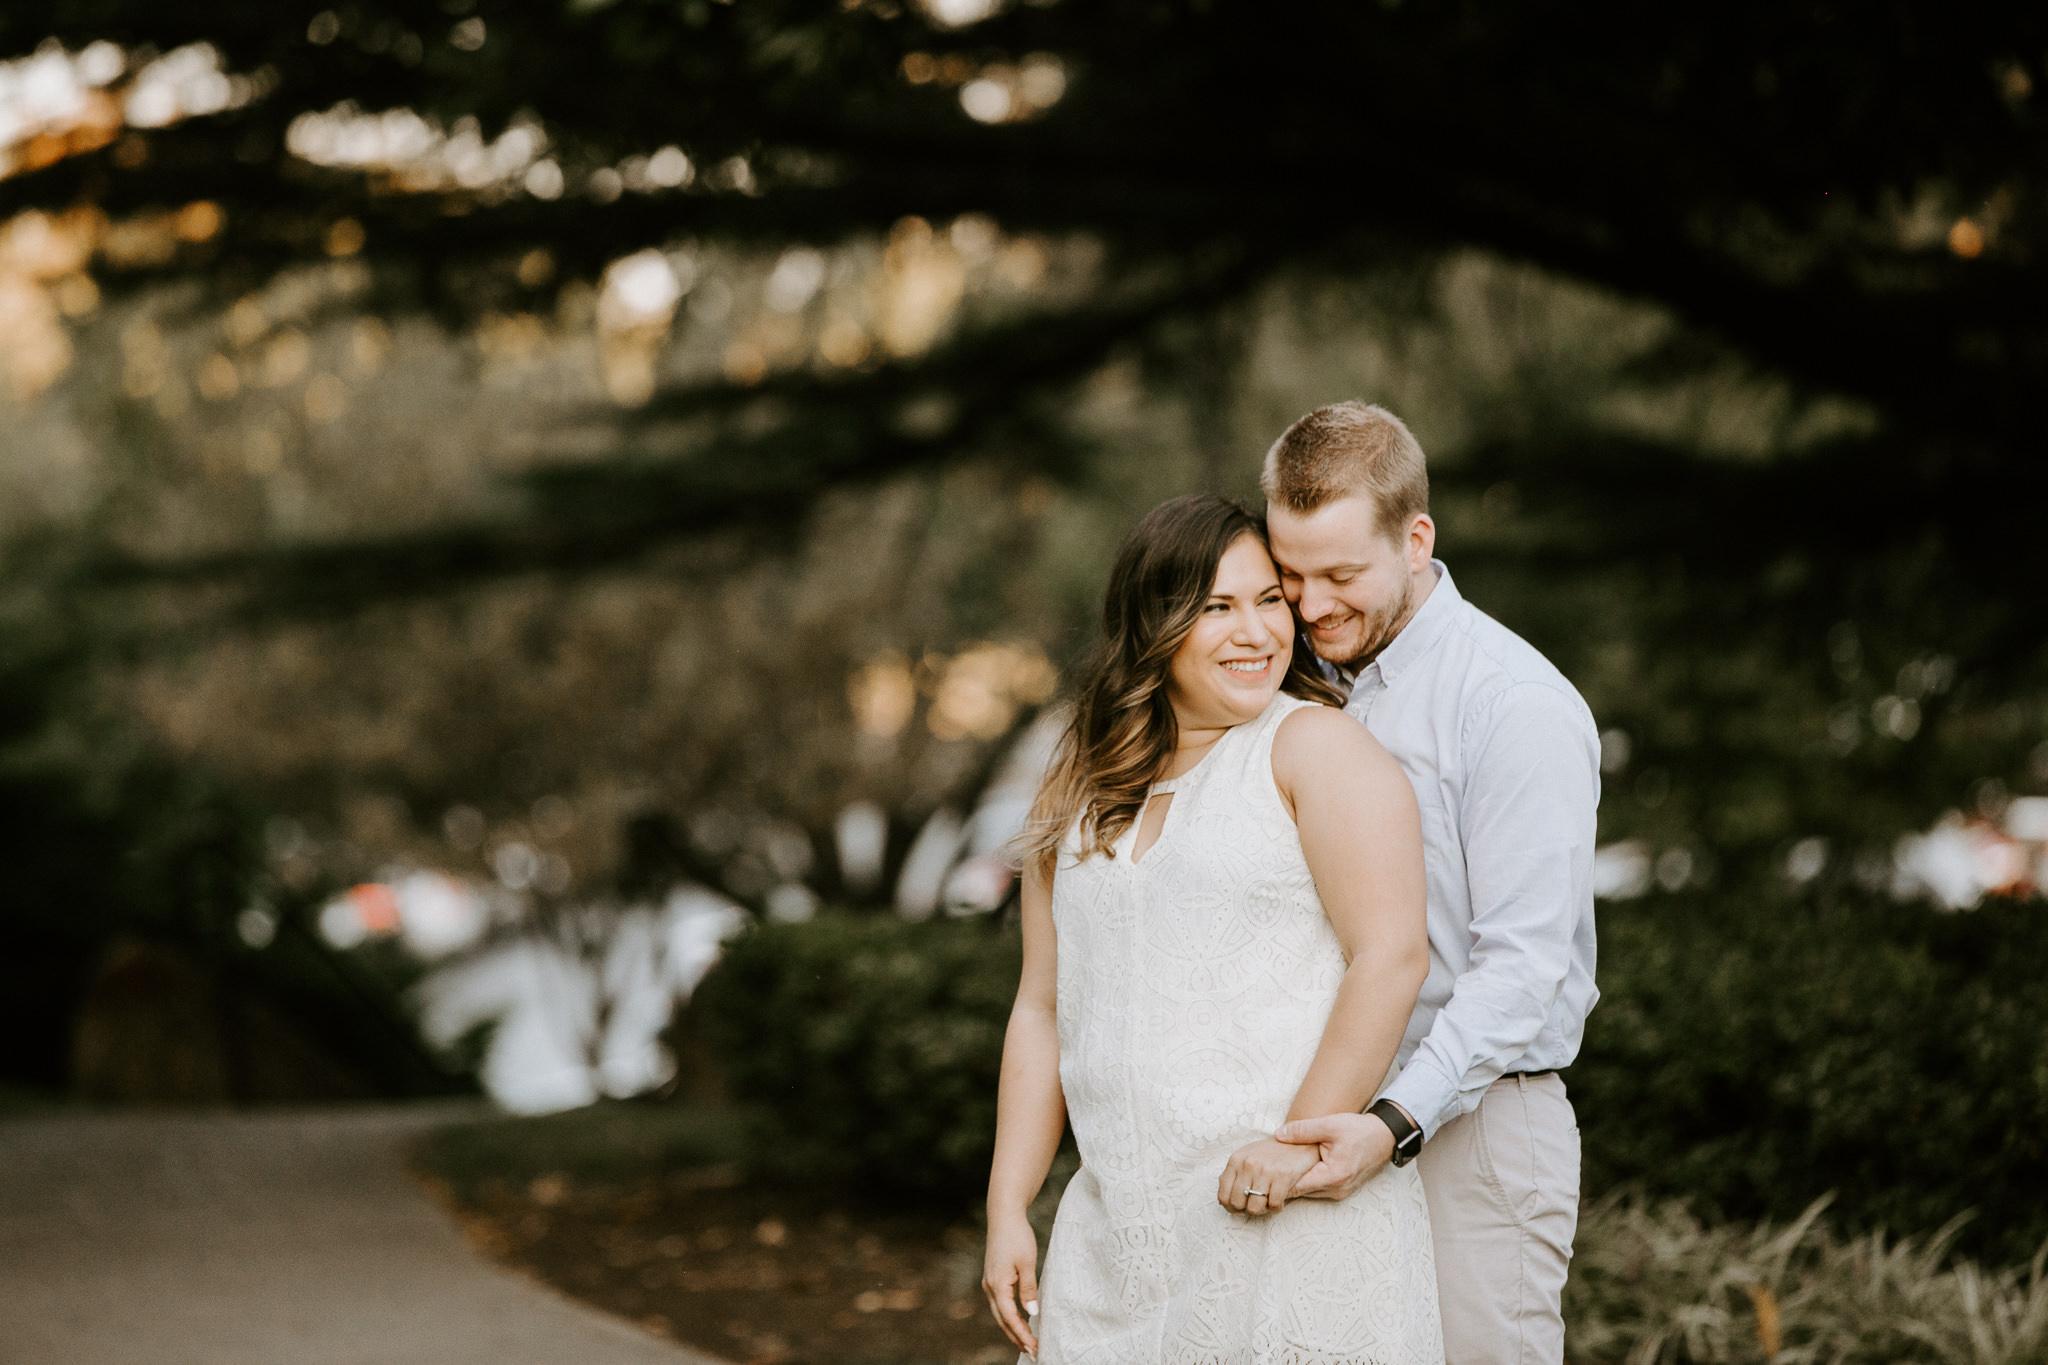 Engagement - Downtown Roanoke -  Wedding Photographer - Virginia - Best - Pat Cori Photography-22.jpg